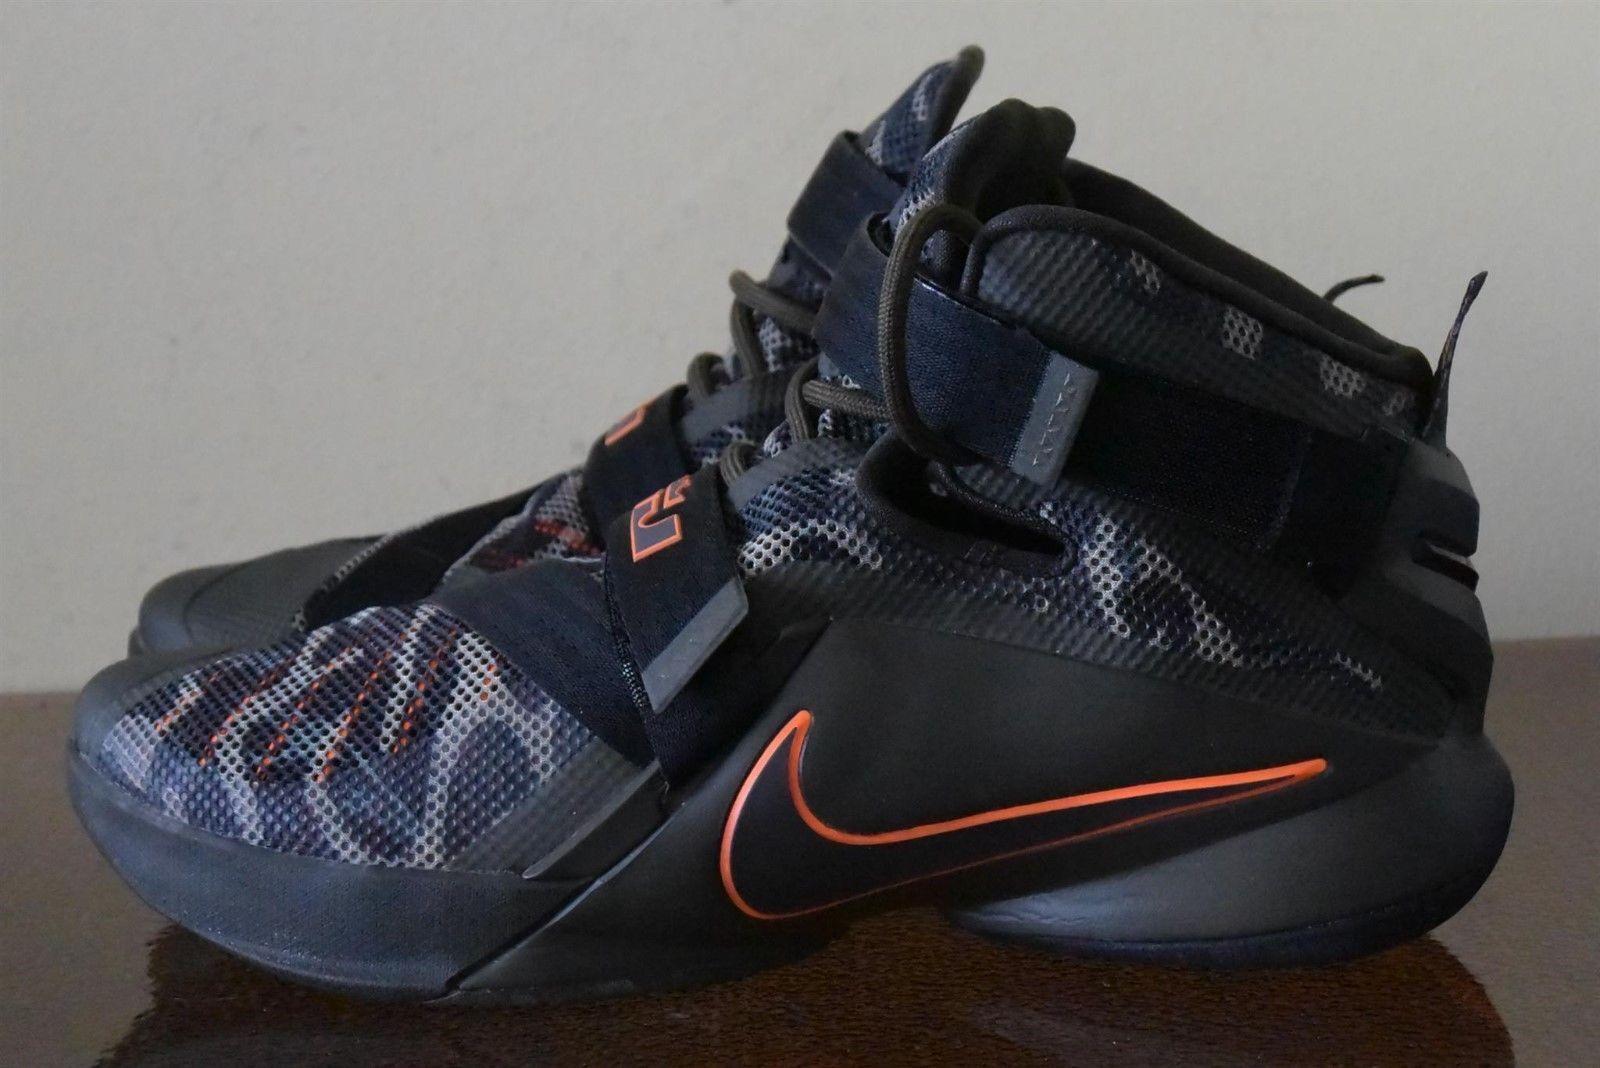 Nike LeBron Zoom Soldier IX 9 Black Camo Dunkman 749490-303 Sz. 10